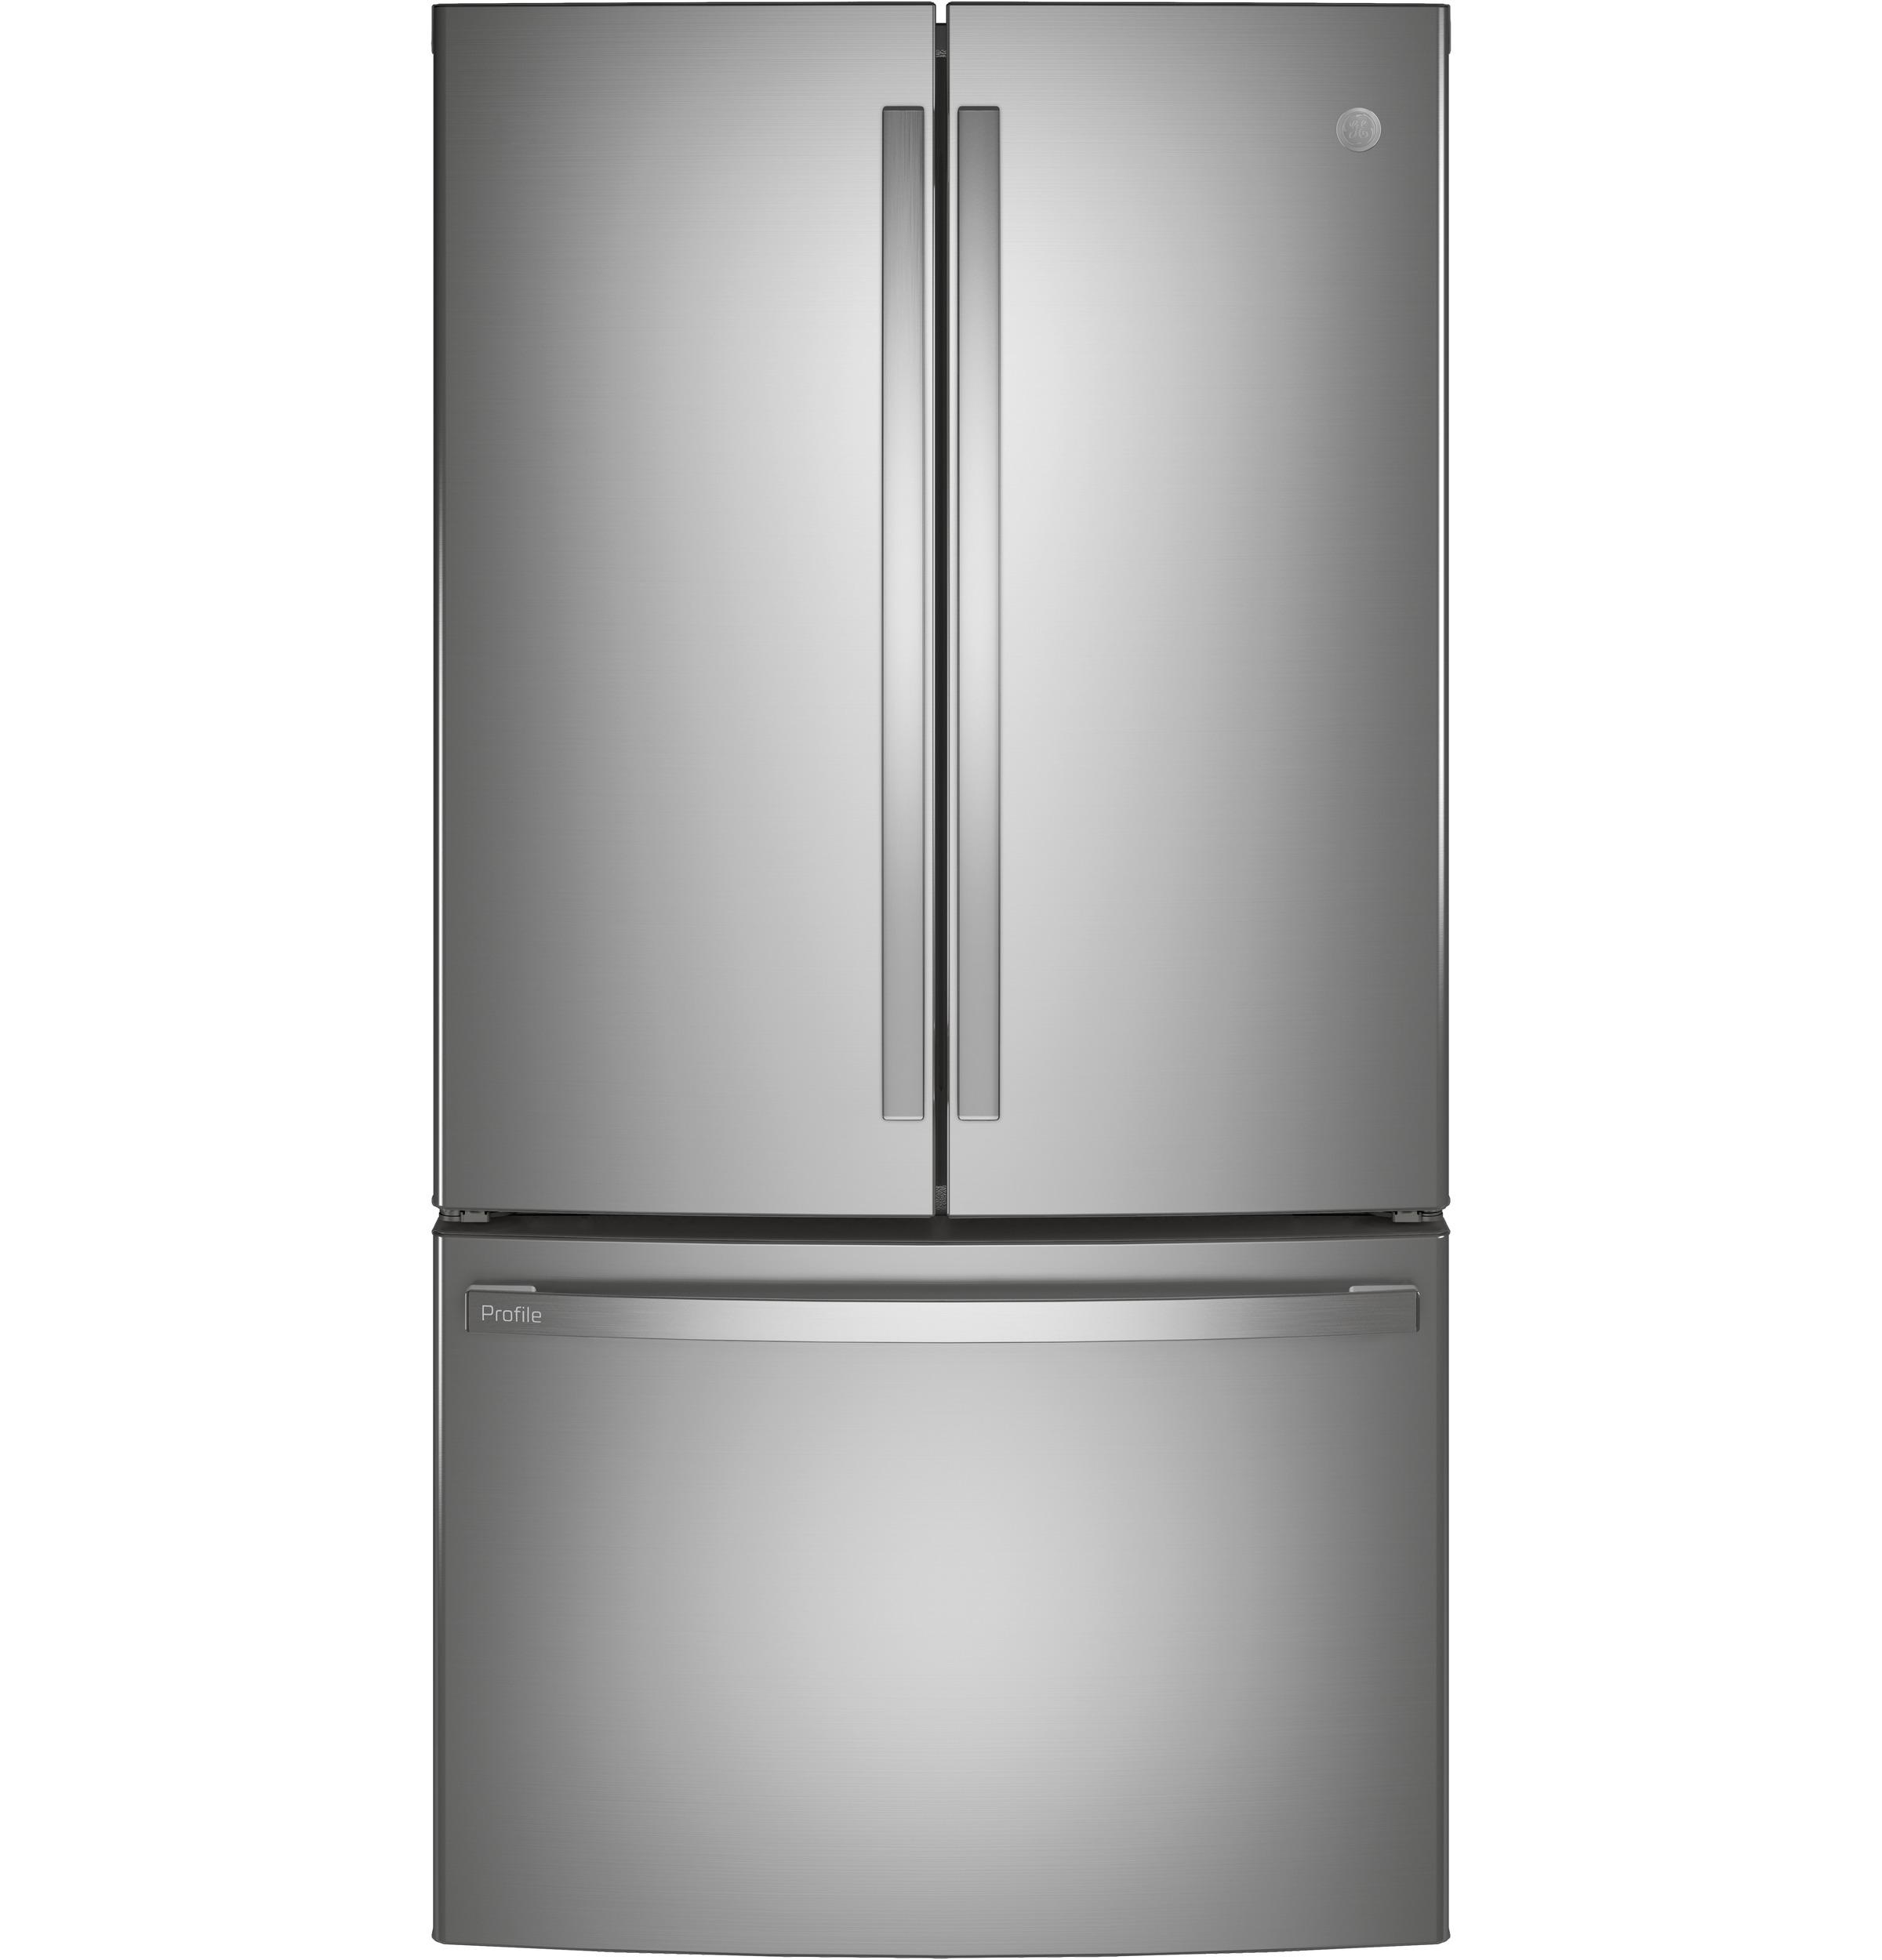 GE Profile GE Profile™ ENERGY STAR® 23.1 Cu. Ft. Counter-Depth French-Door Refrigerator